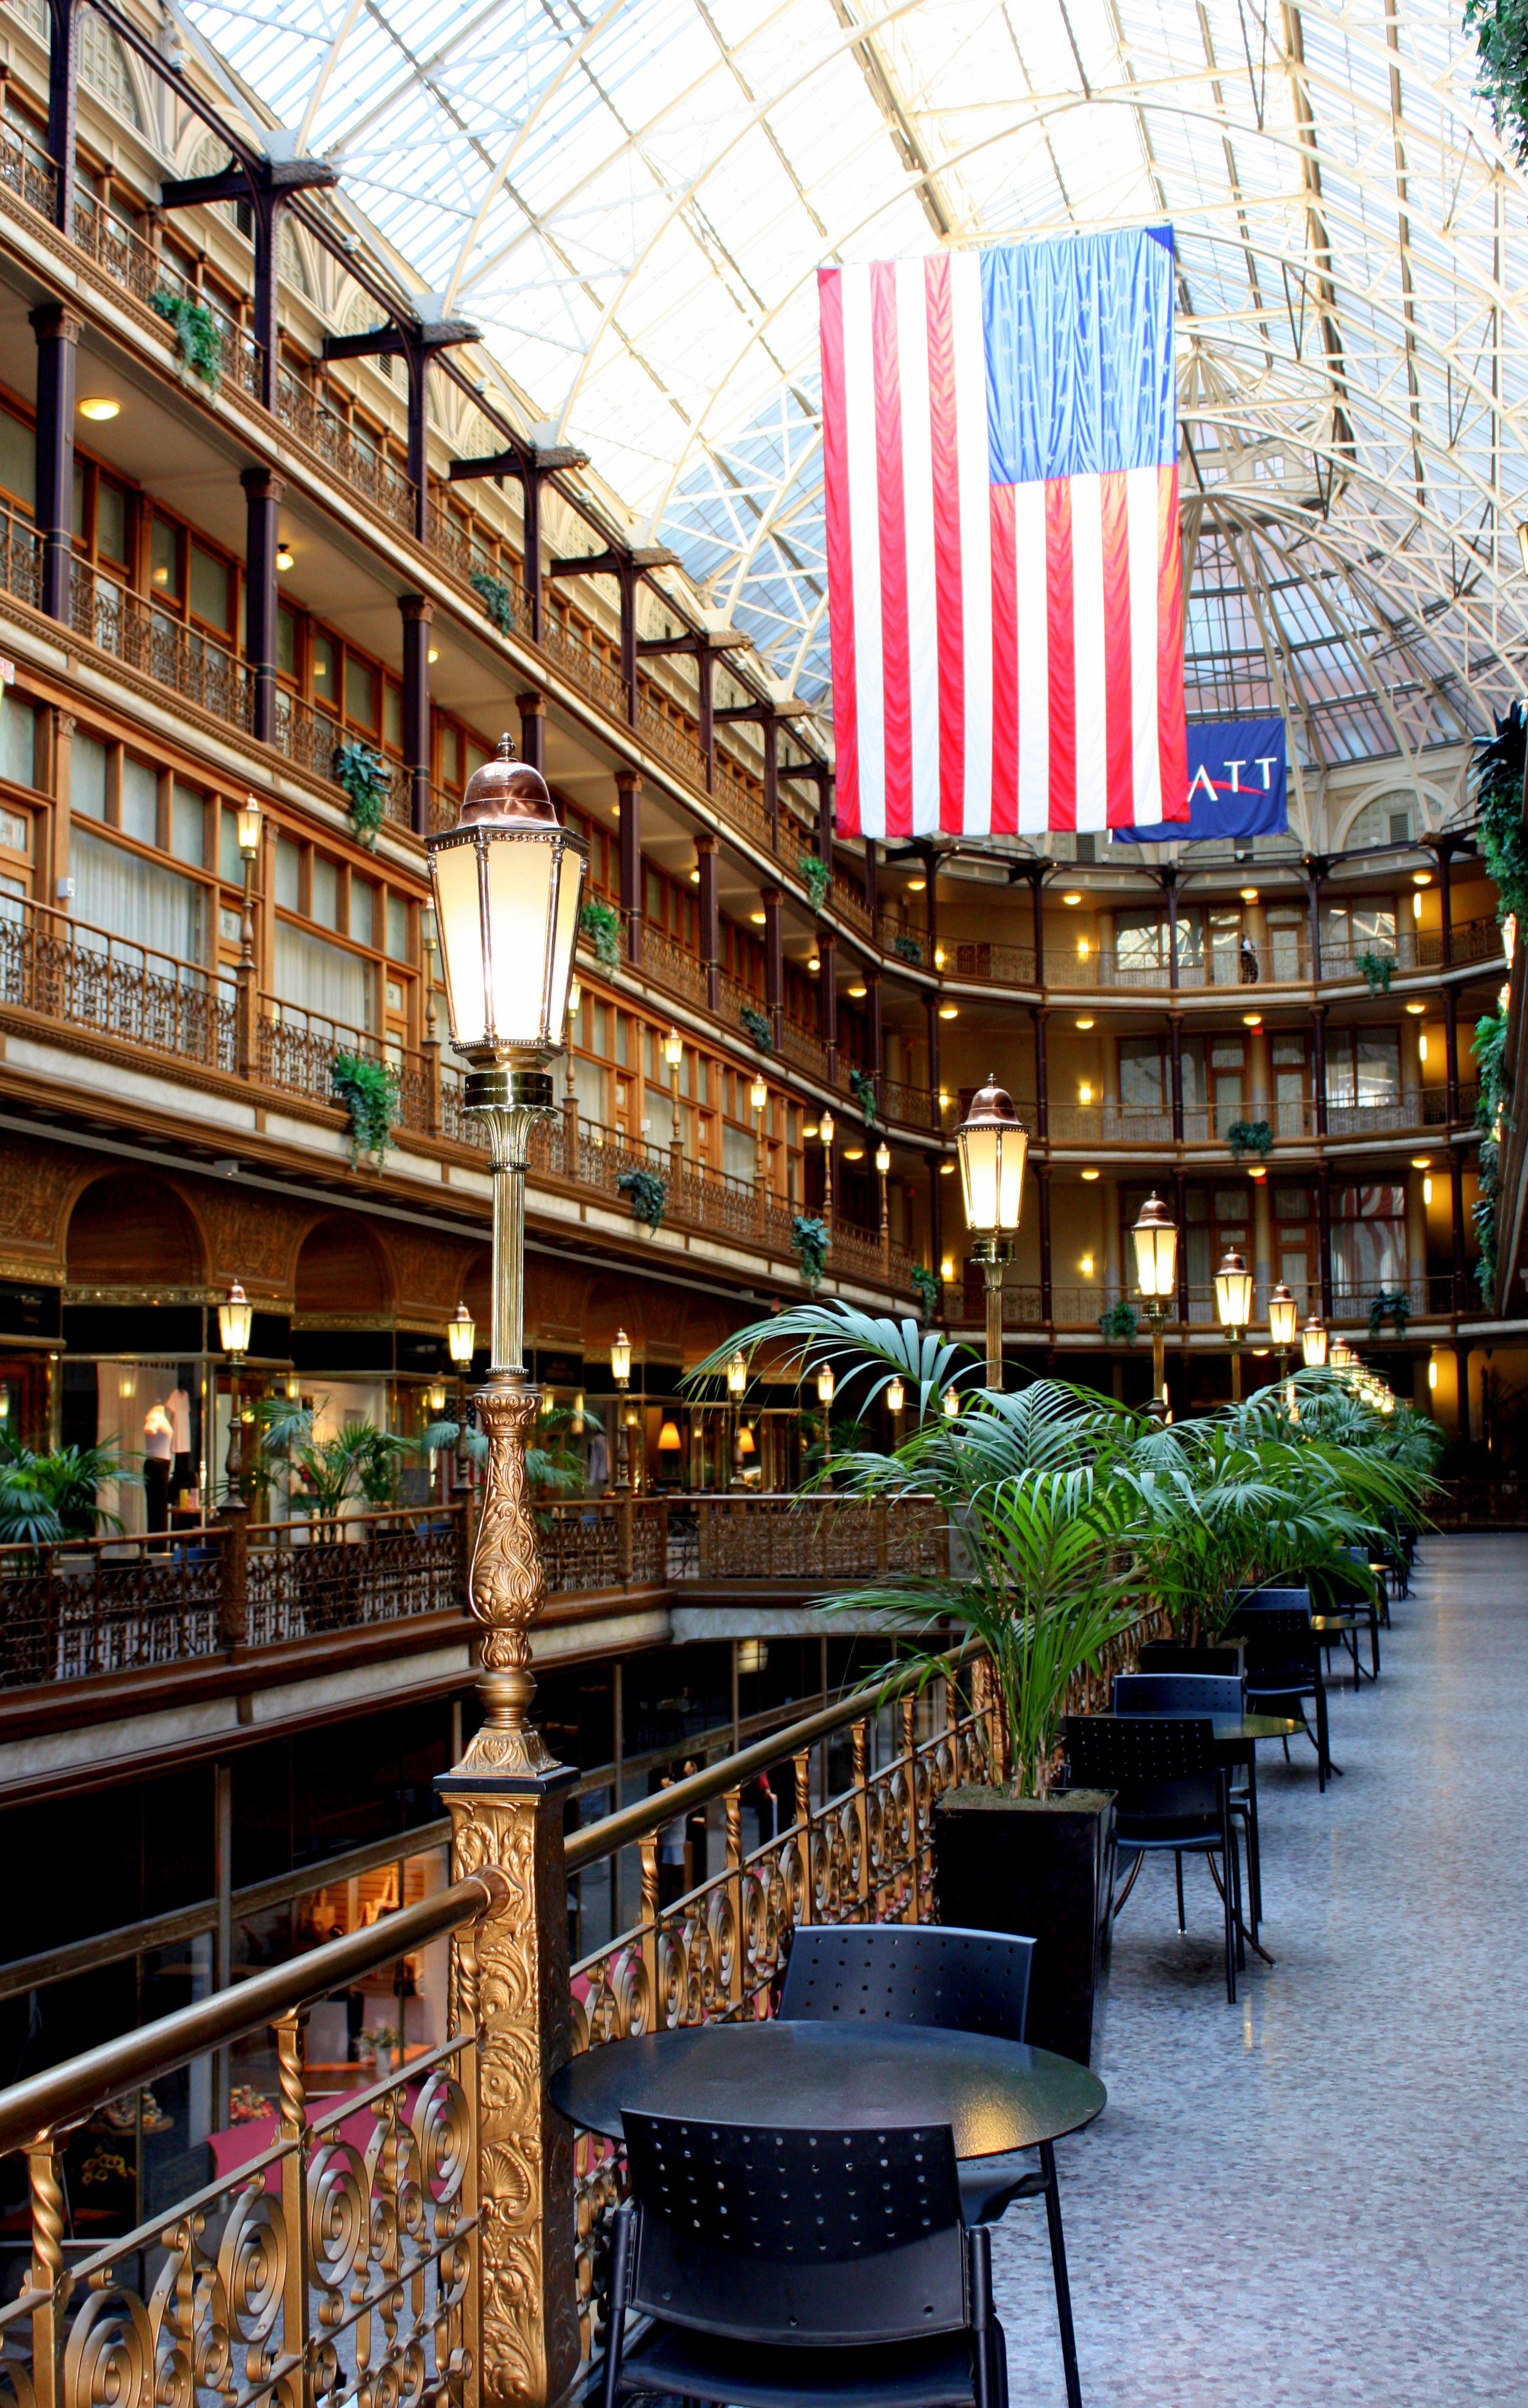 Clevelands historic architecture  Antonio Rambls travels